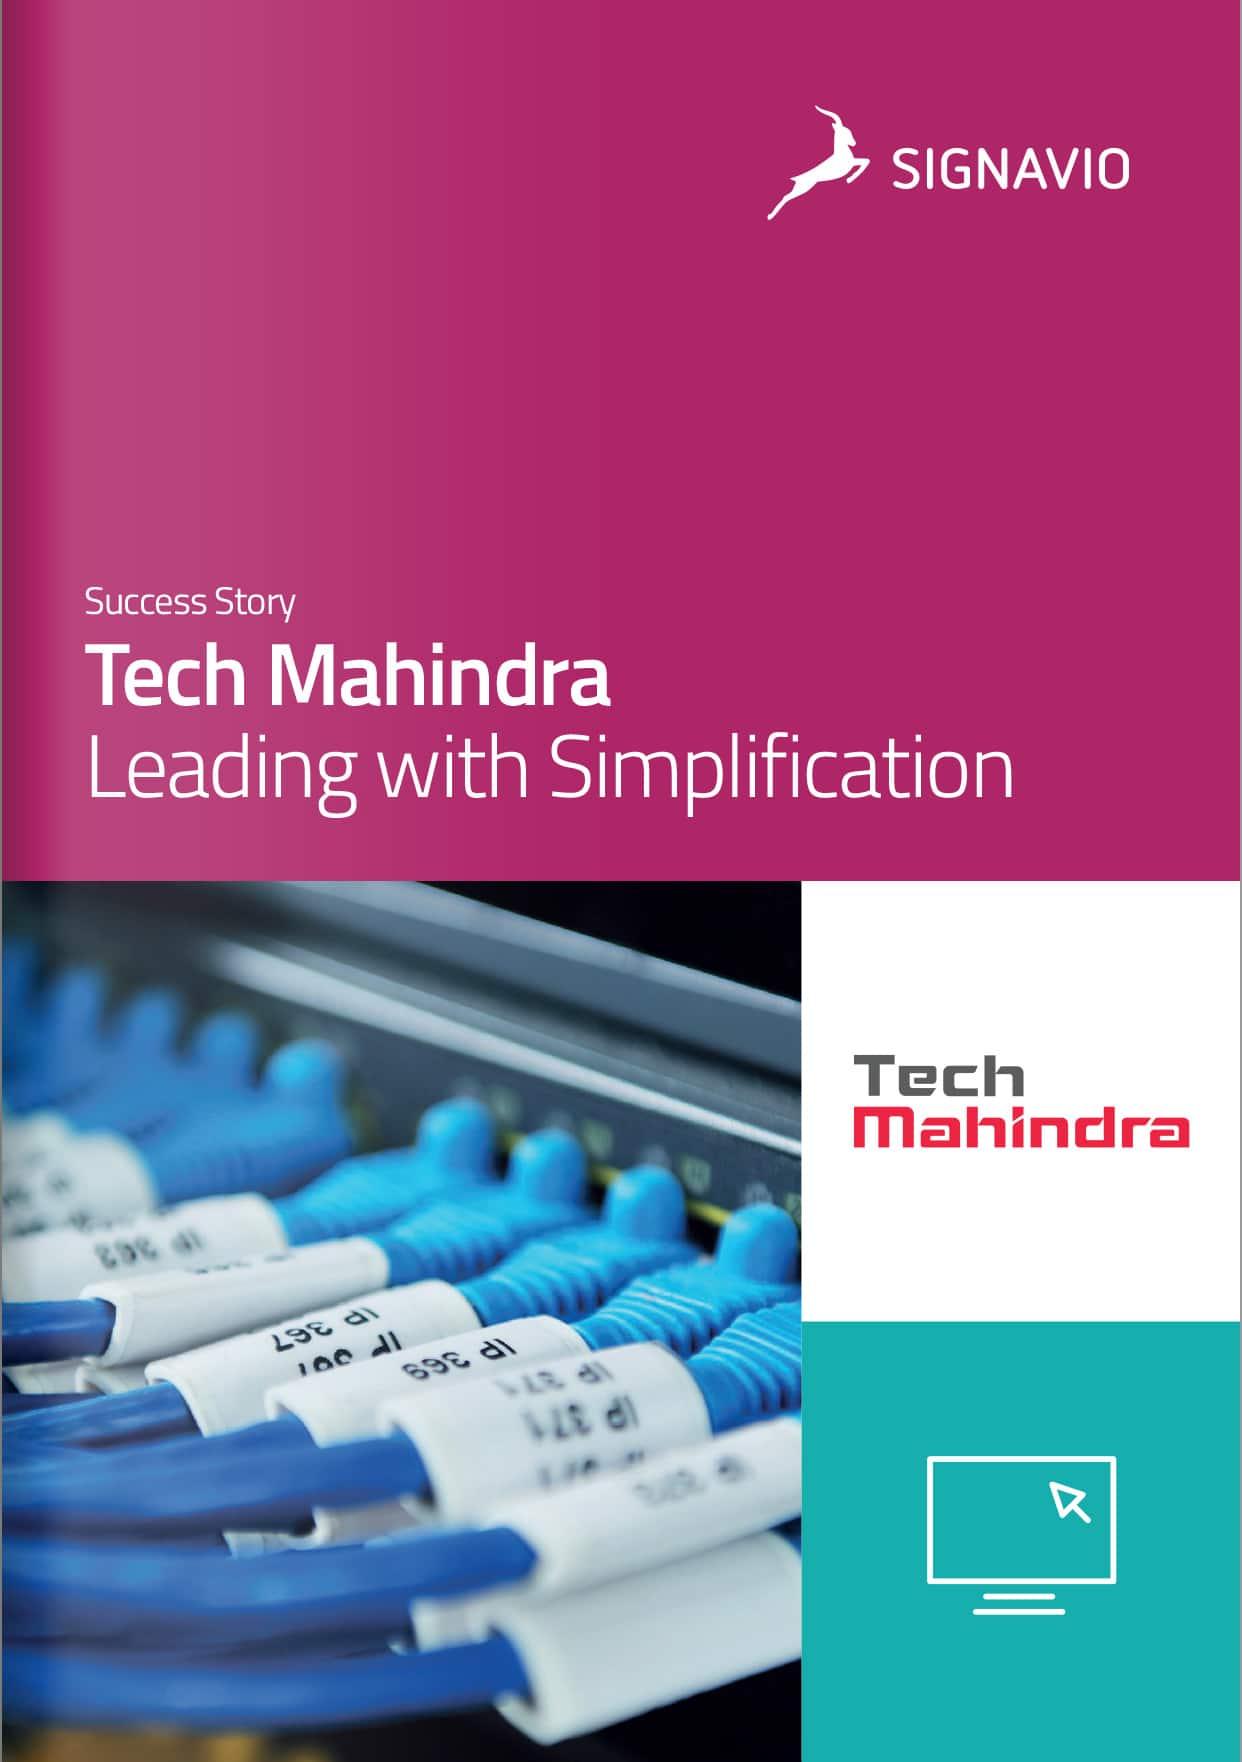 Tech Mahindra customer success story cover image